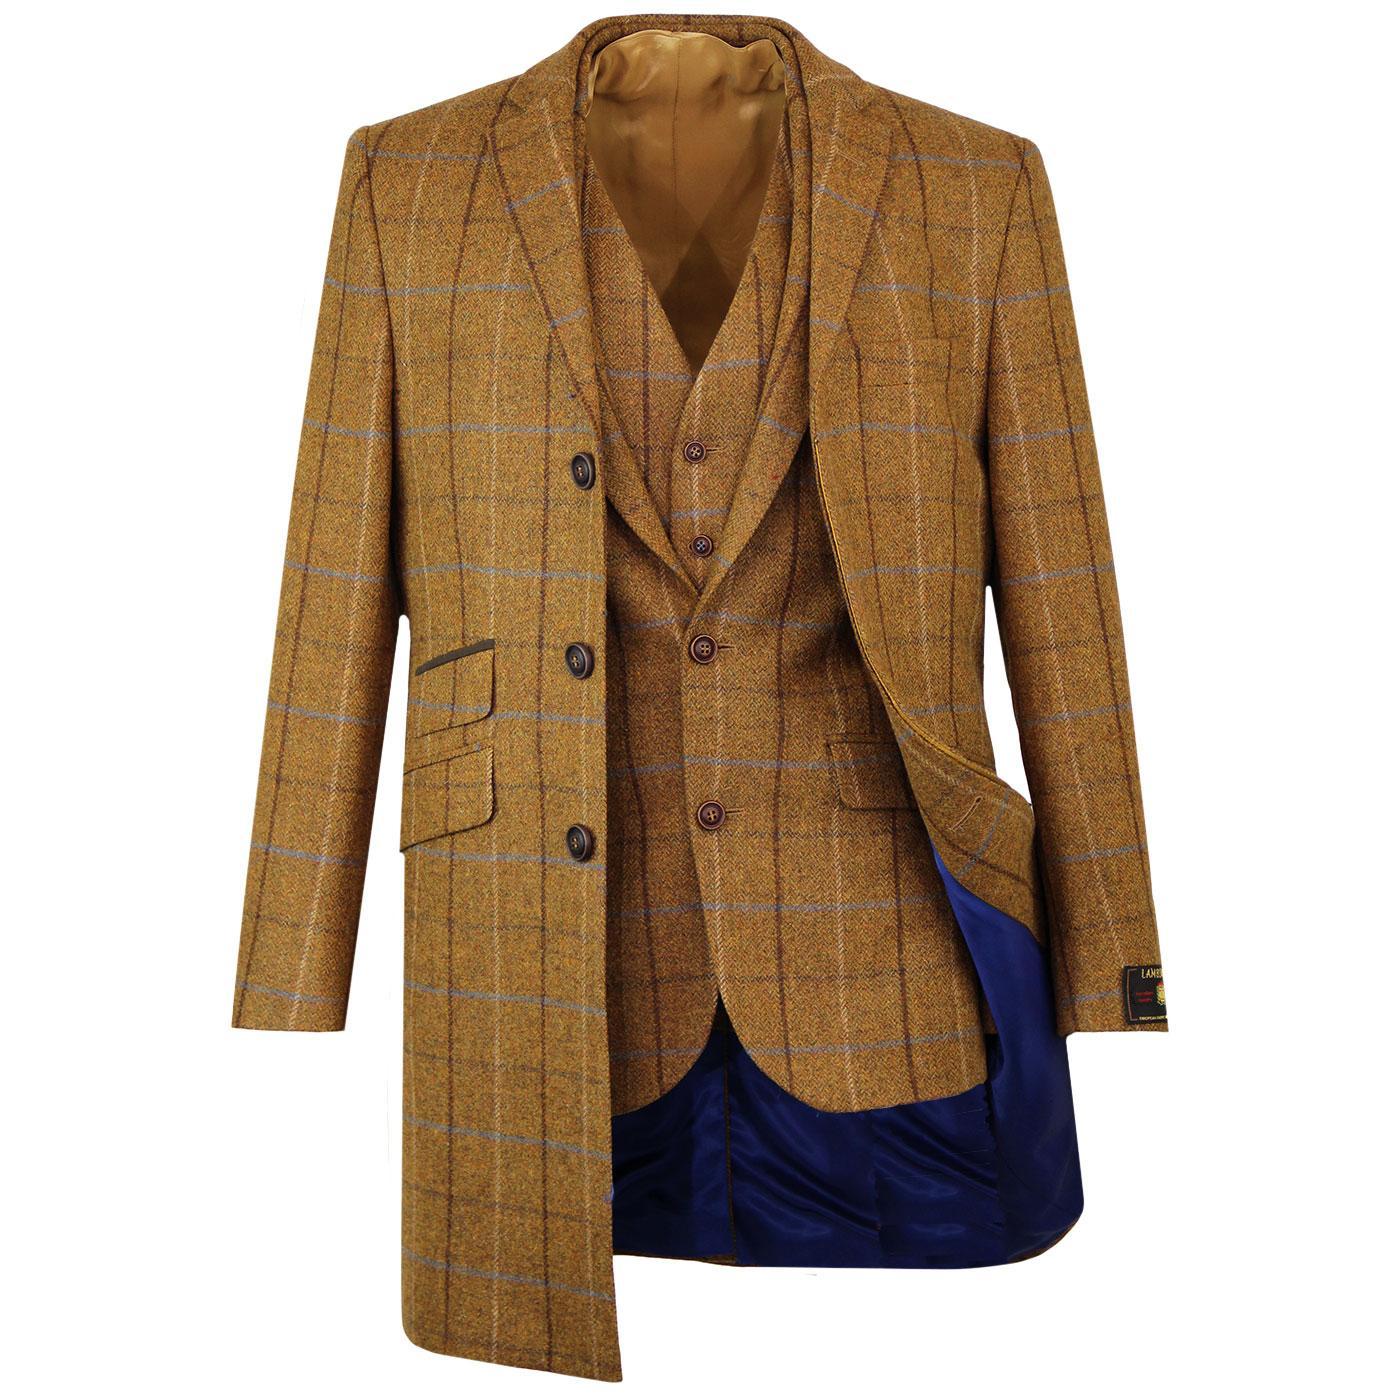 Mod Four Colour Gold Coat, Blazer & Waistcoat